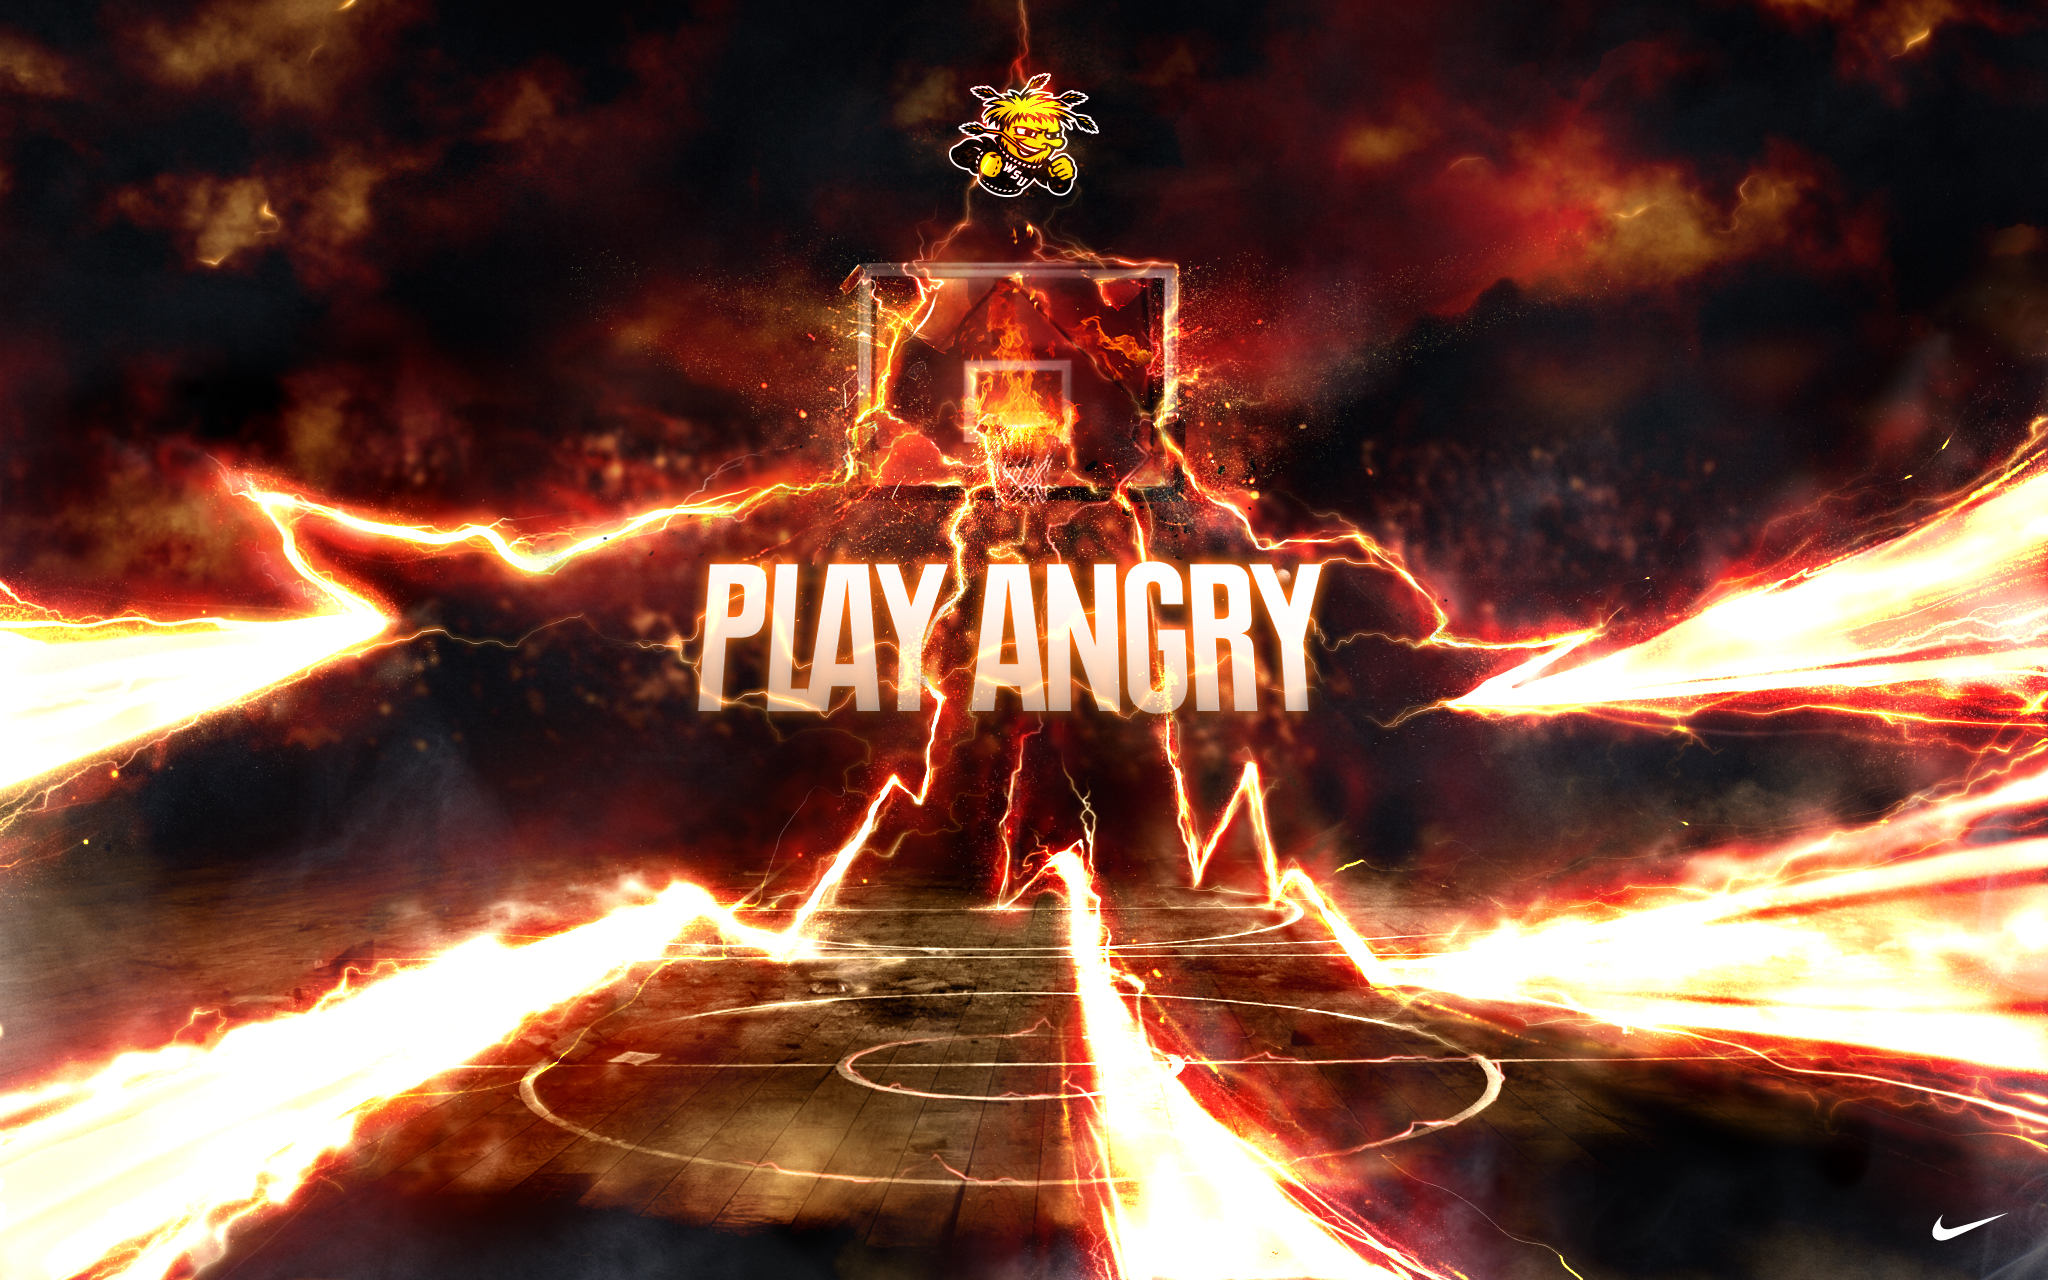 Angry_Lightning.jpg